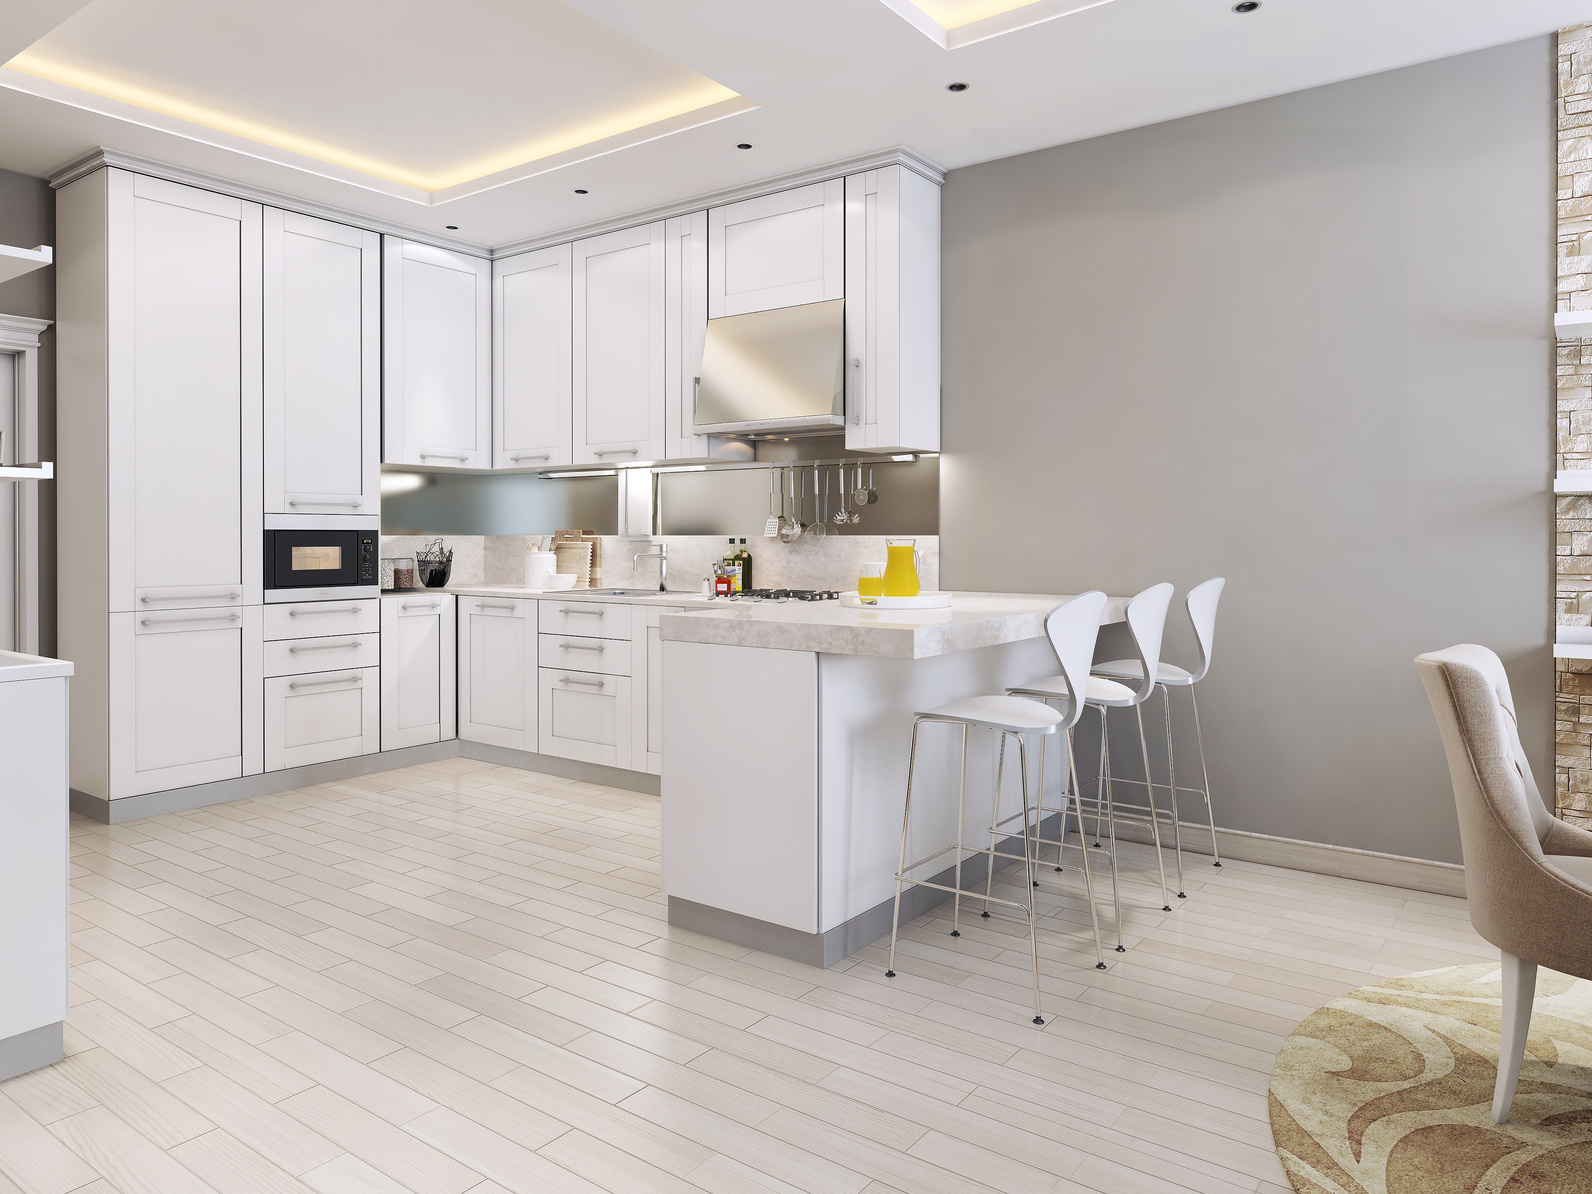 Küchen lack – sehremini